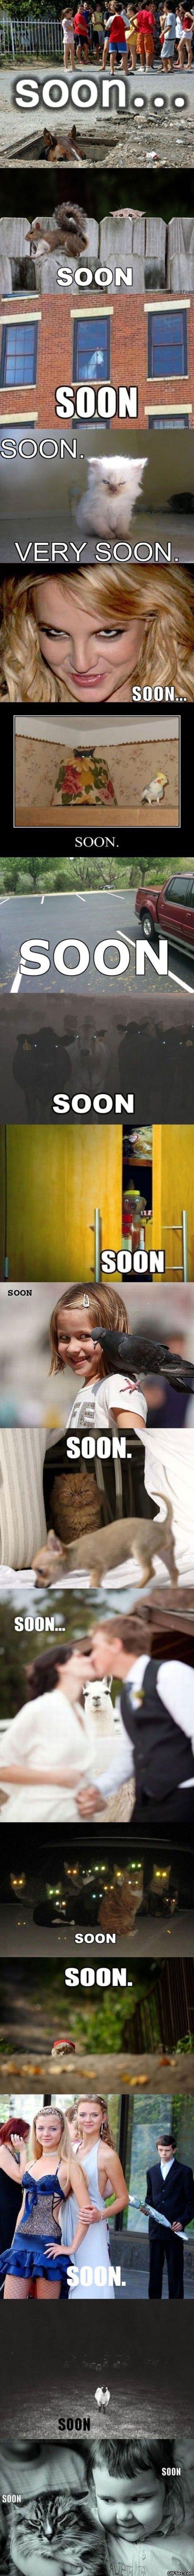 Soon MEME